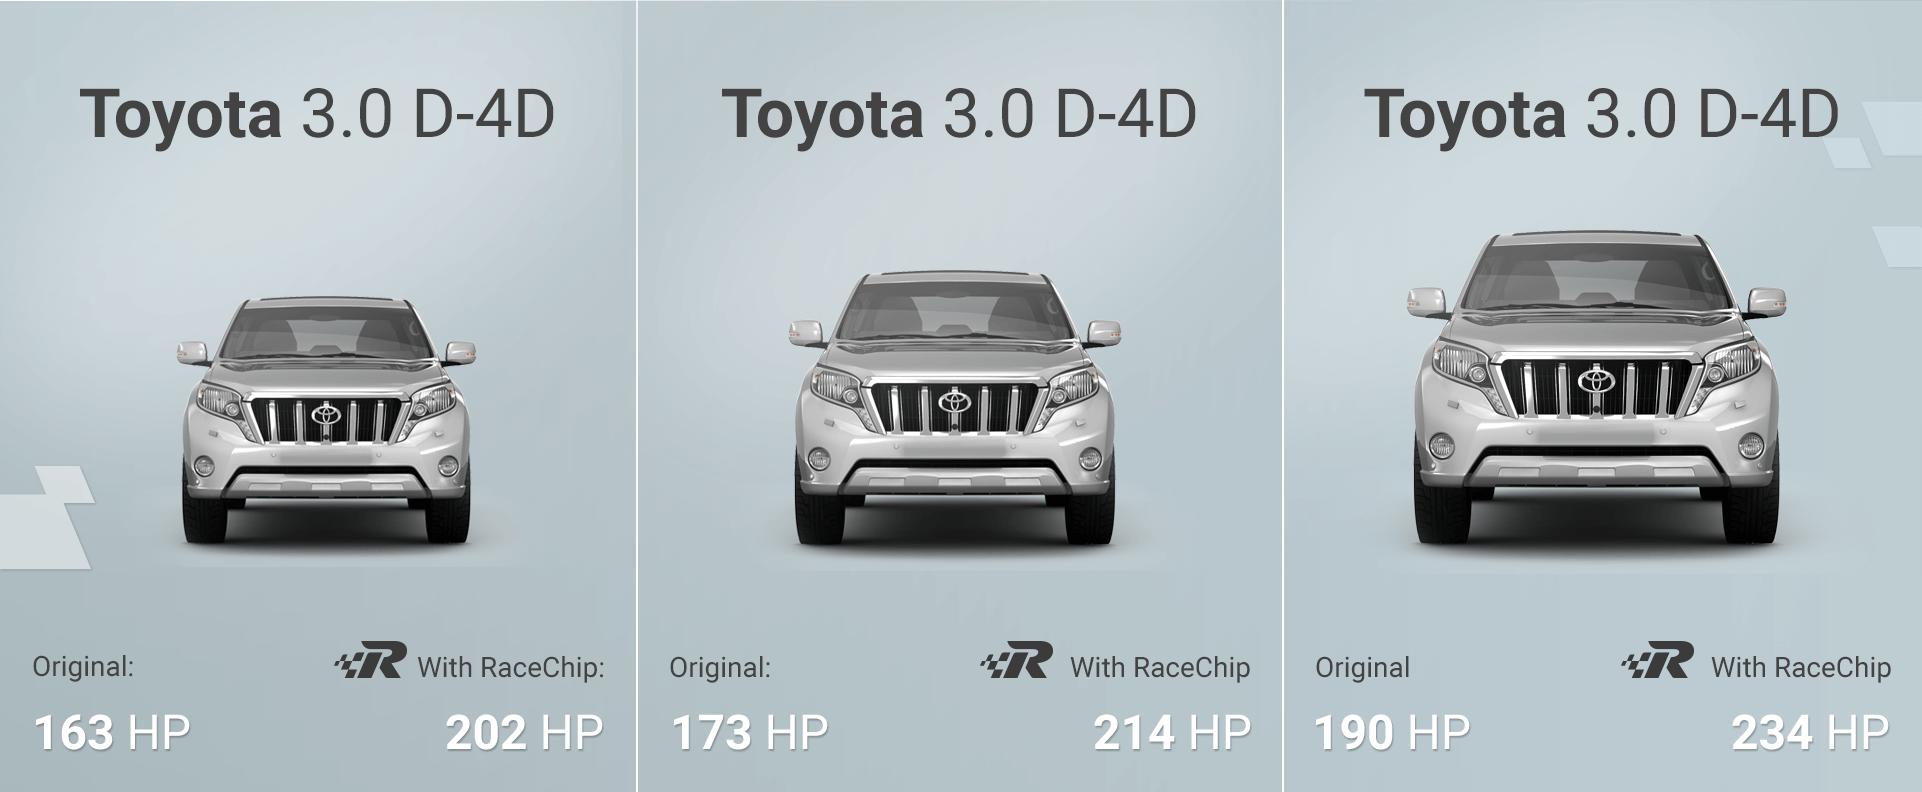 Performance Tuning Gain 30 Power And Torque Toyota Land Cruiser Prado Engine Turbo Diesel